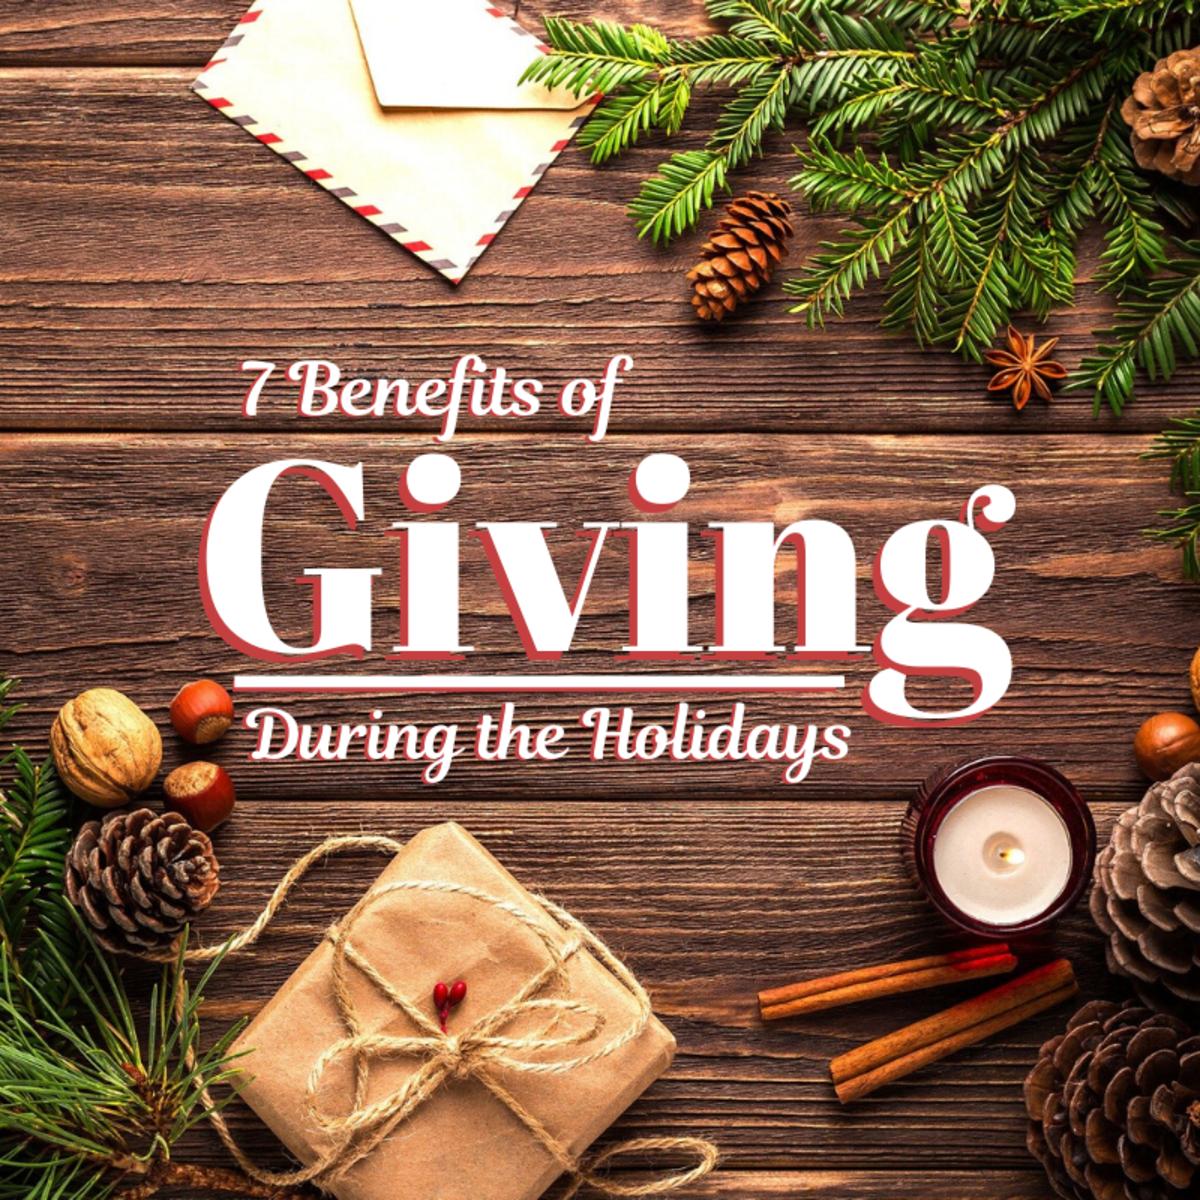 7 Benefits of Giving During the Christmas Season